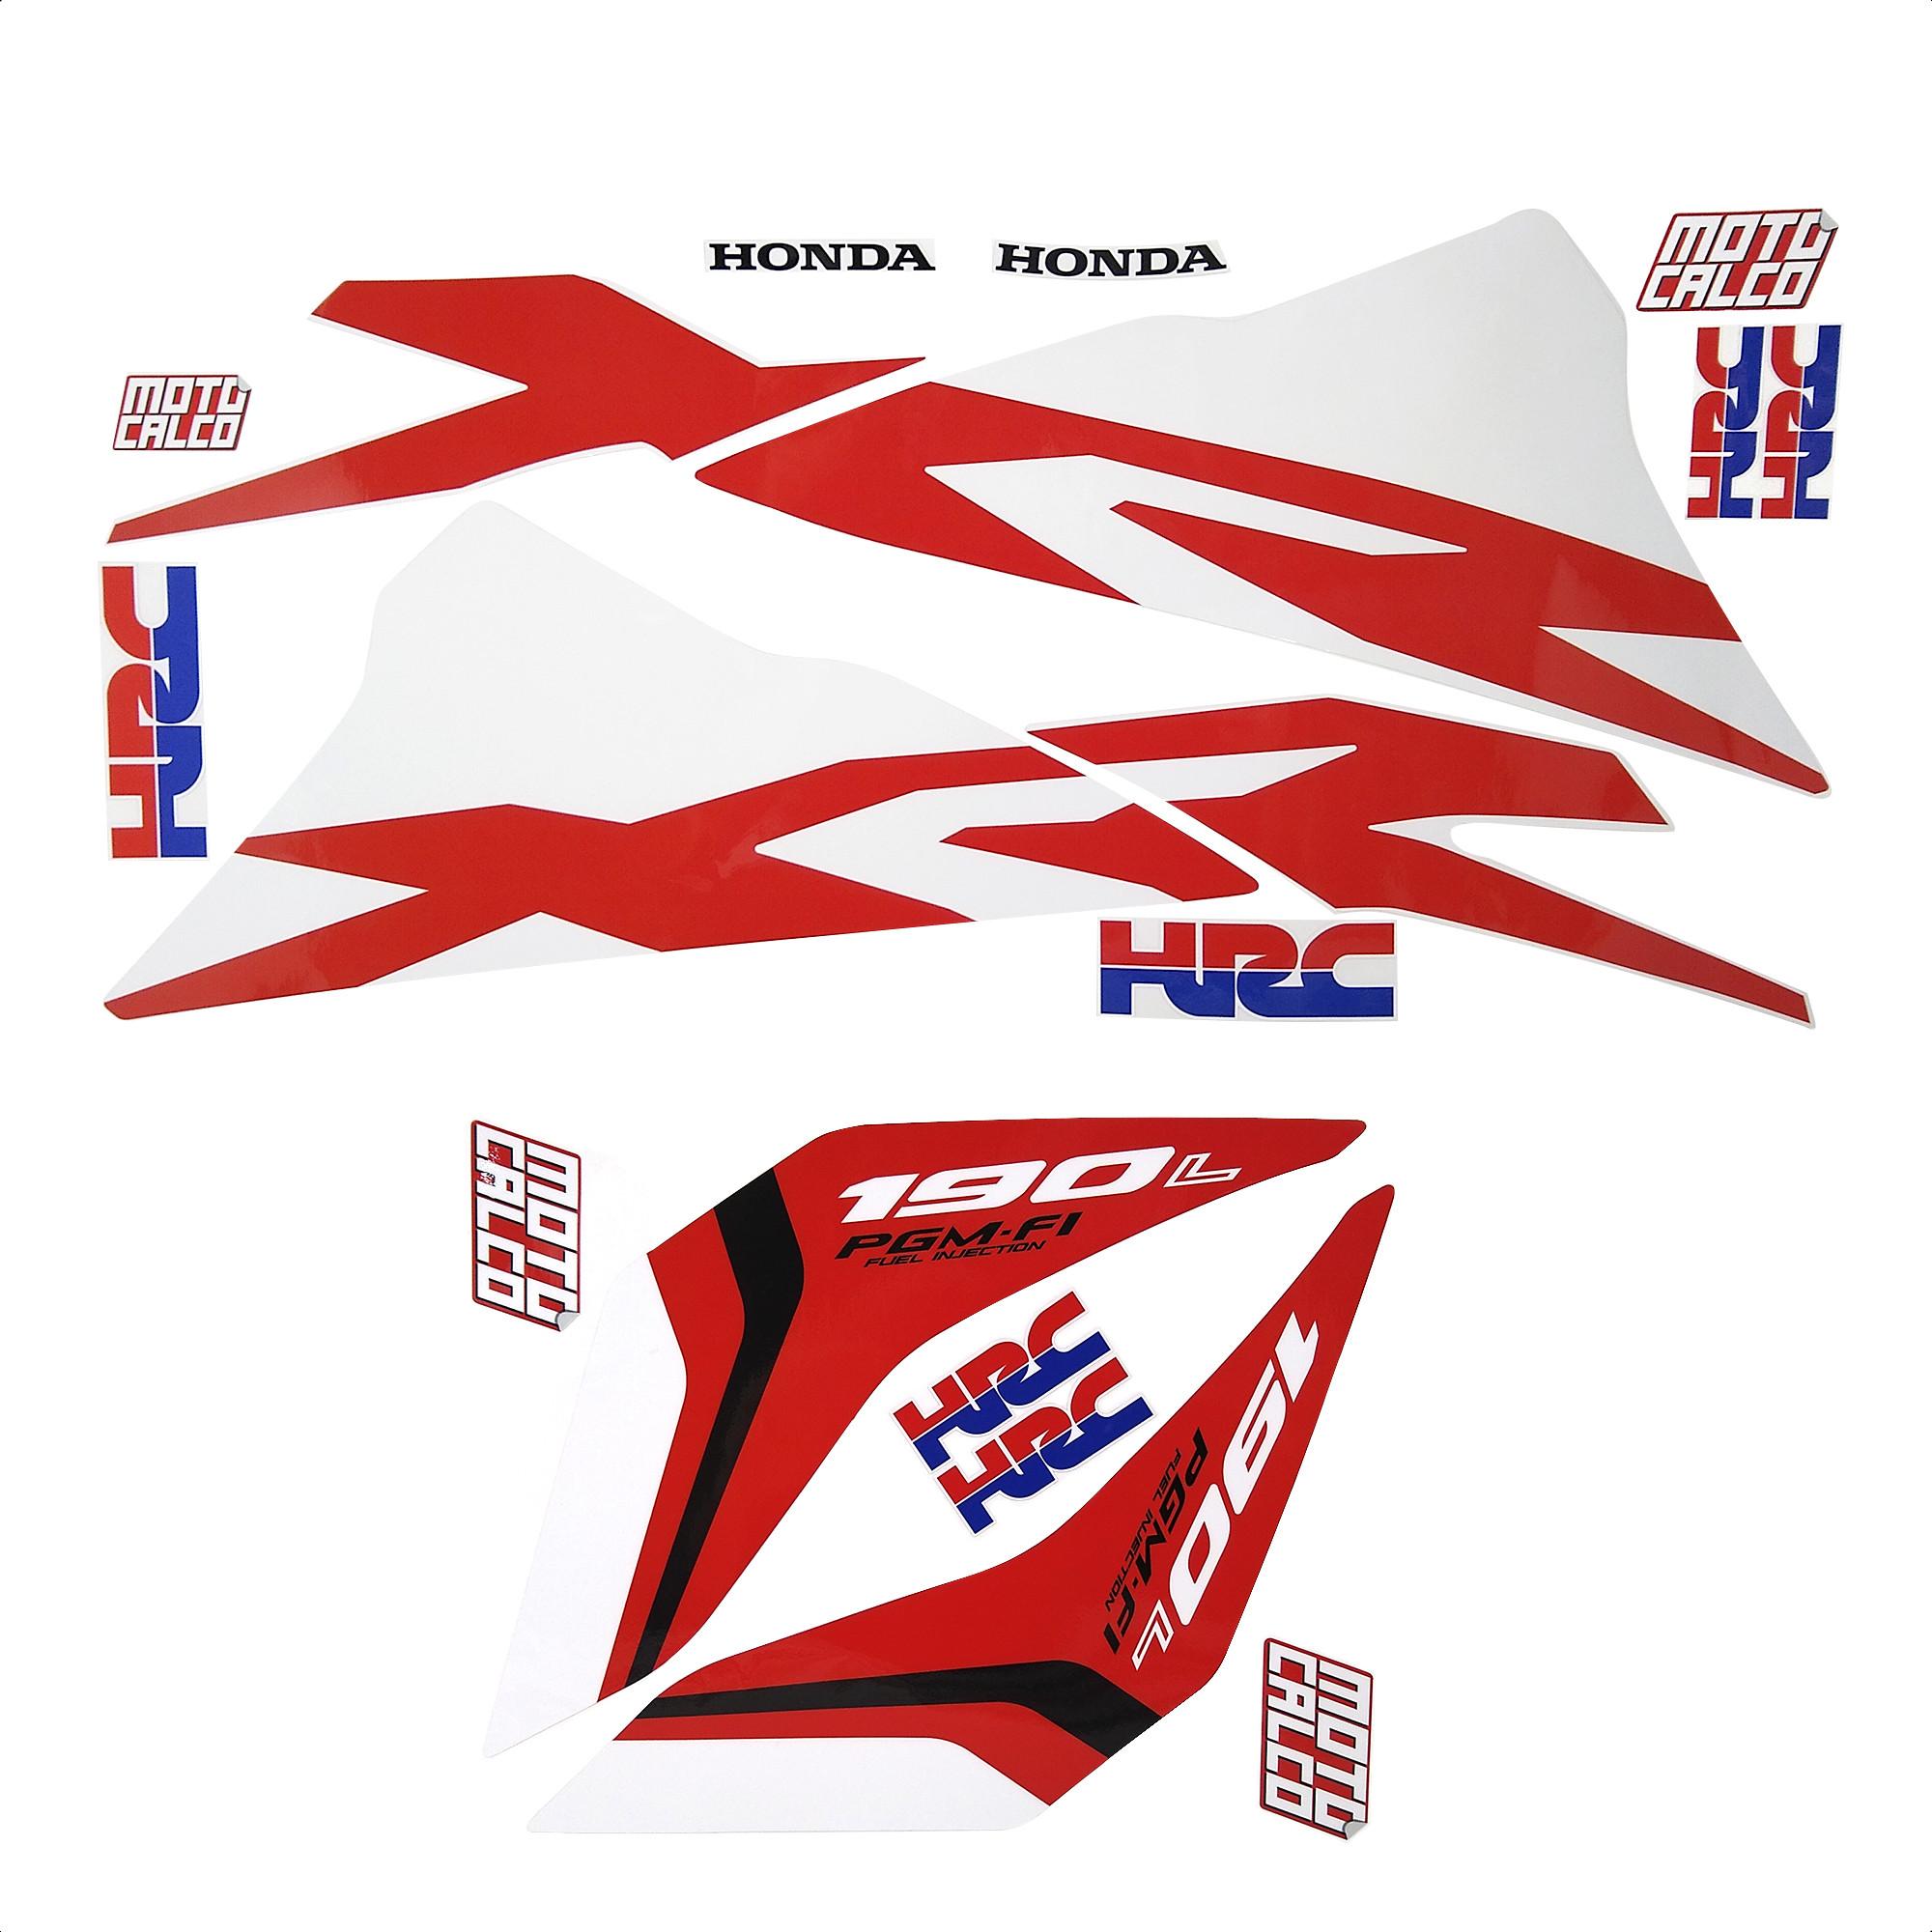 Kit Calcos Honda Xr 190 Blanco 2018 2019 14 Piezas